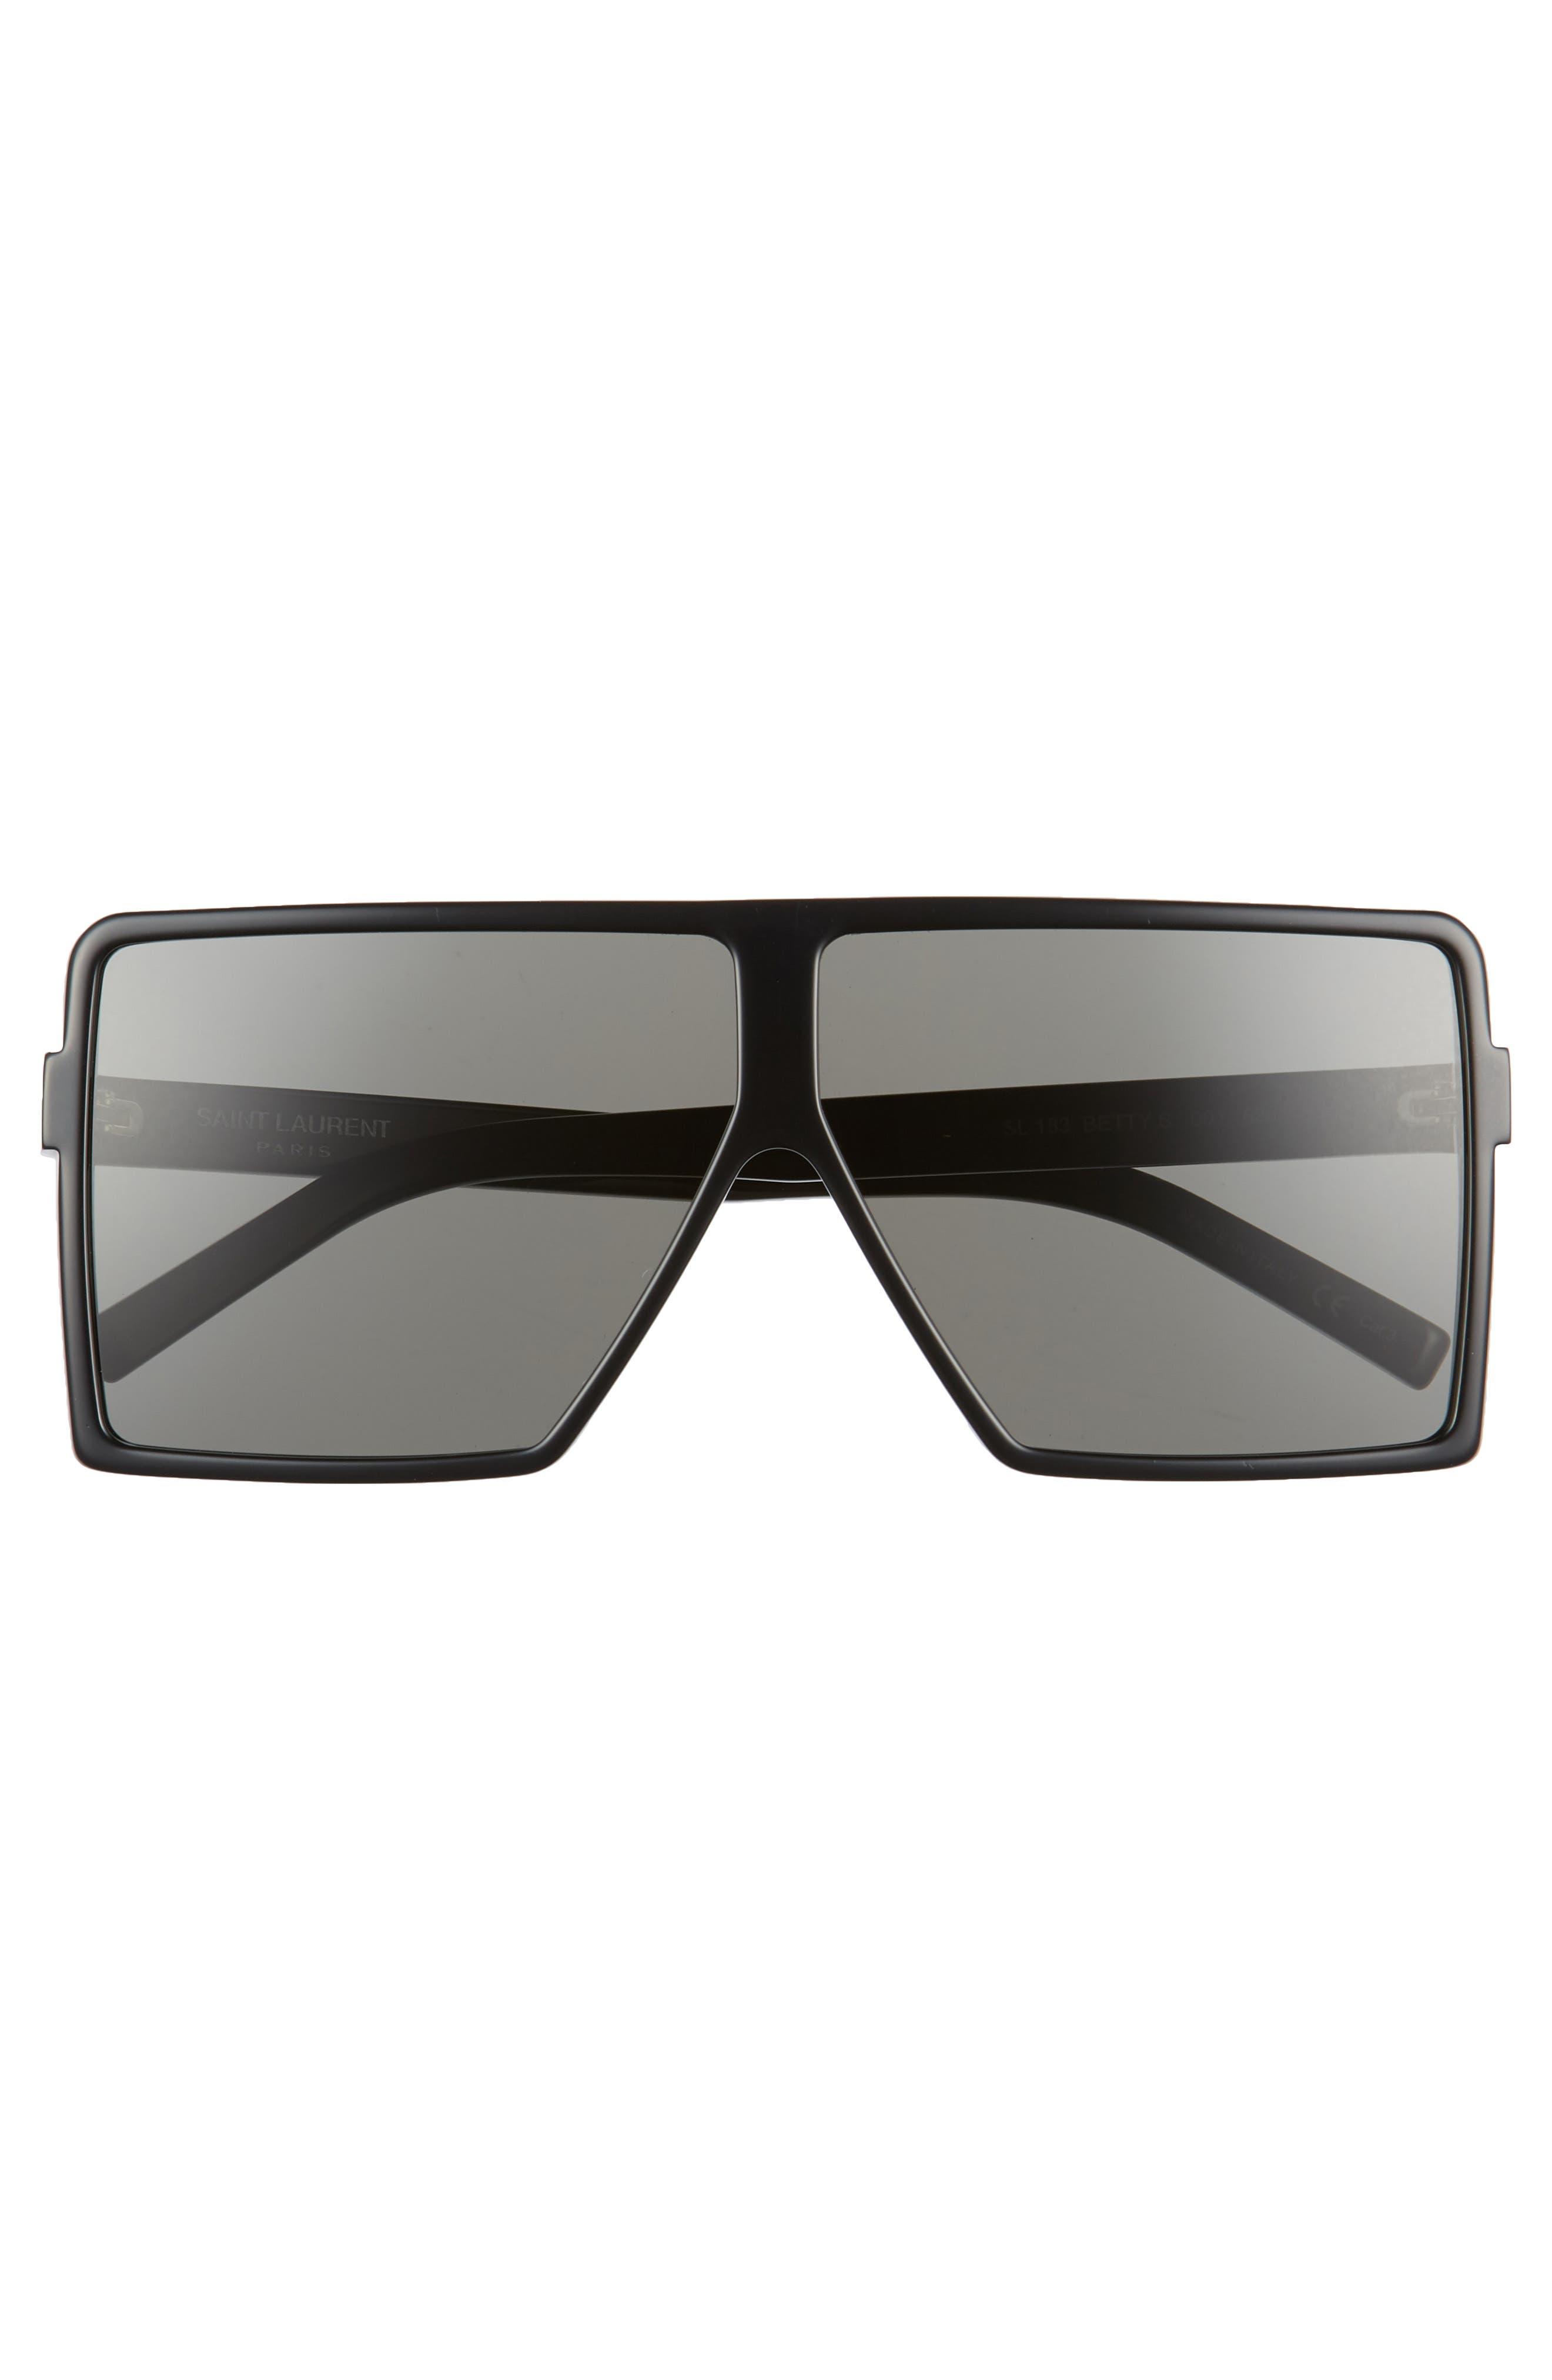 SAINT LAURENT, Betty 63mm Oversize Shield Sunglasses, Alternate thumbnail 3, color, BLACK